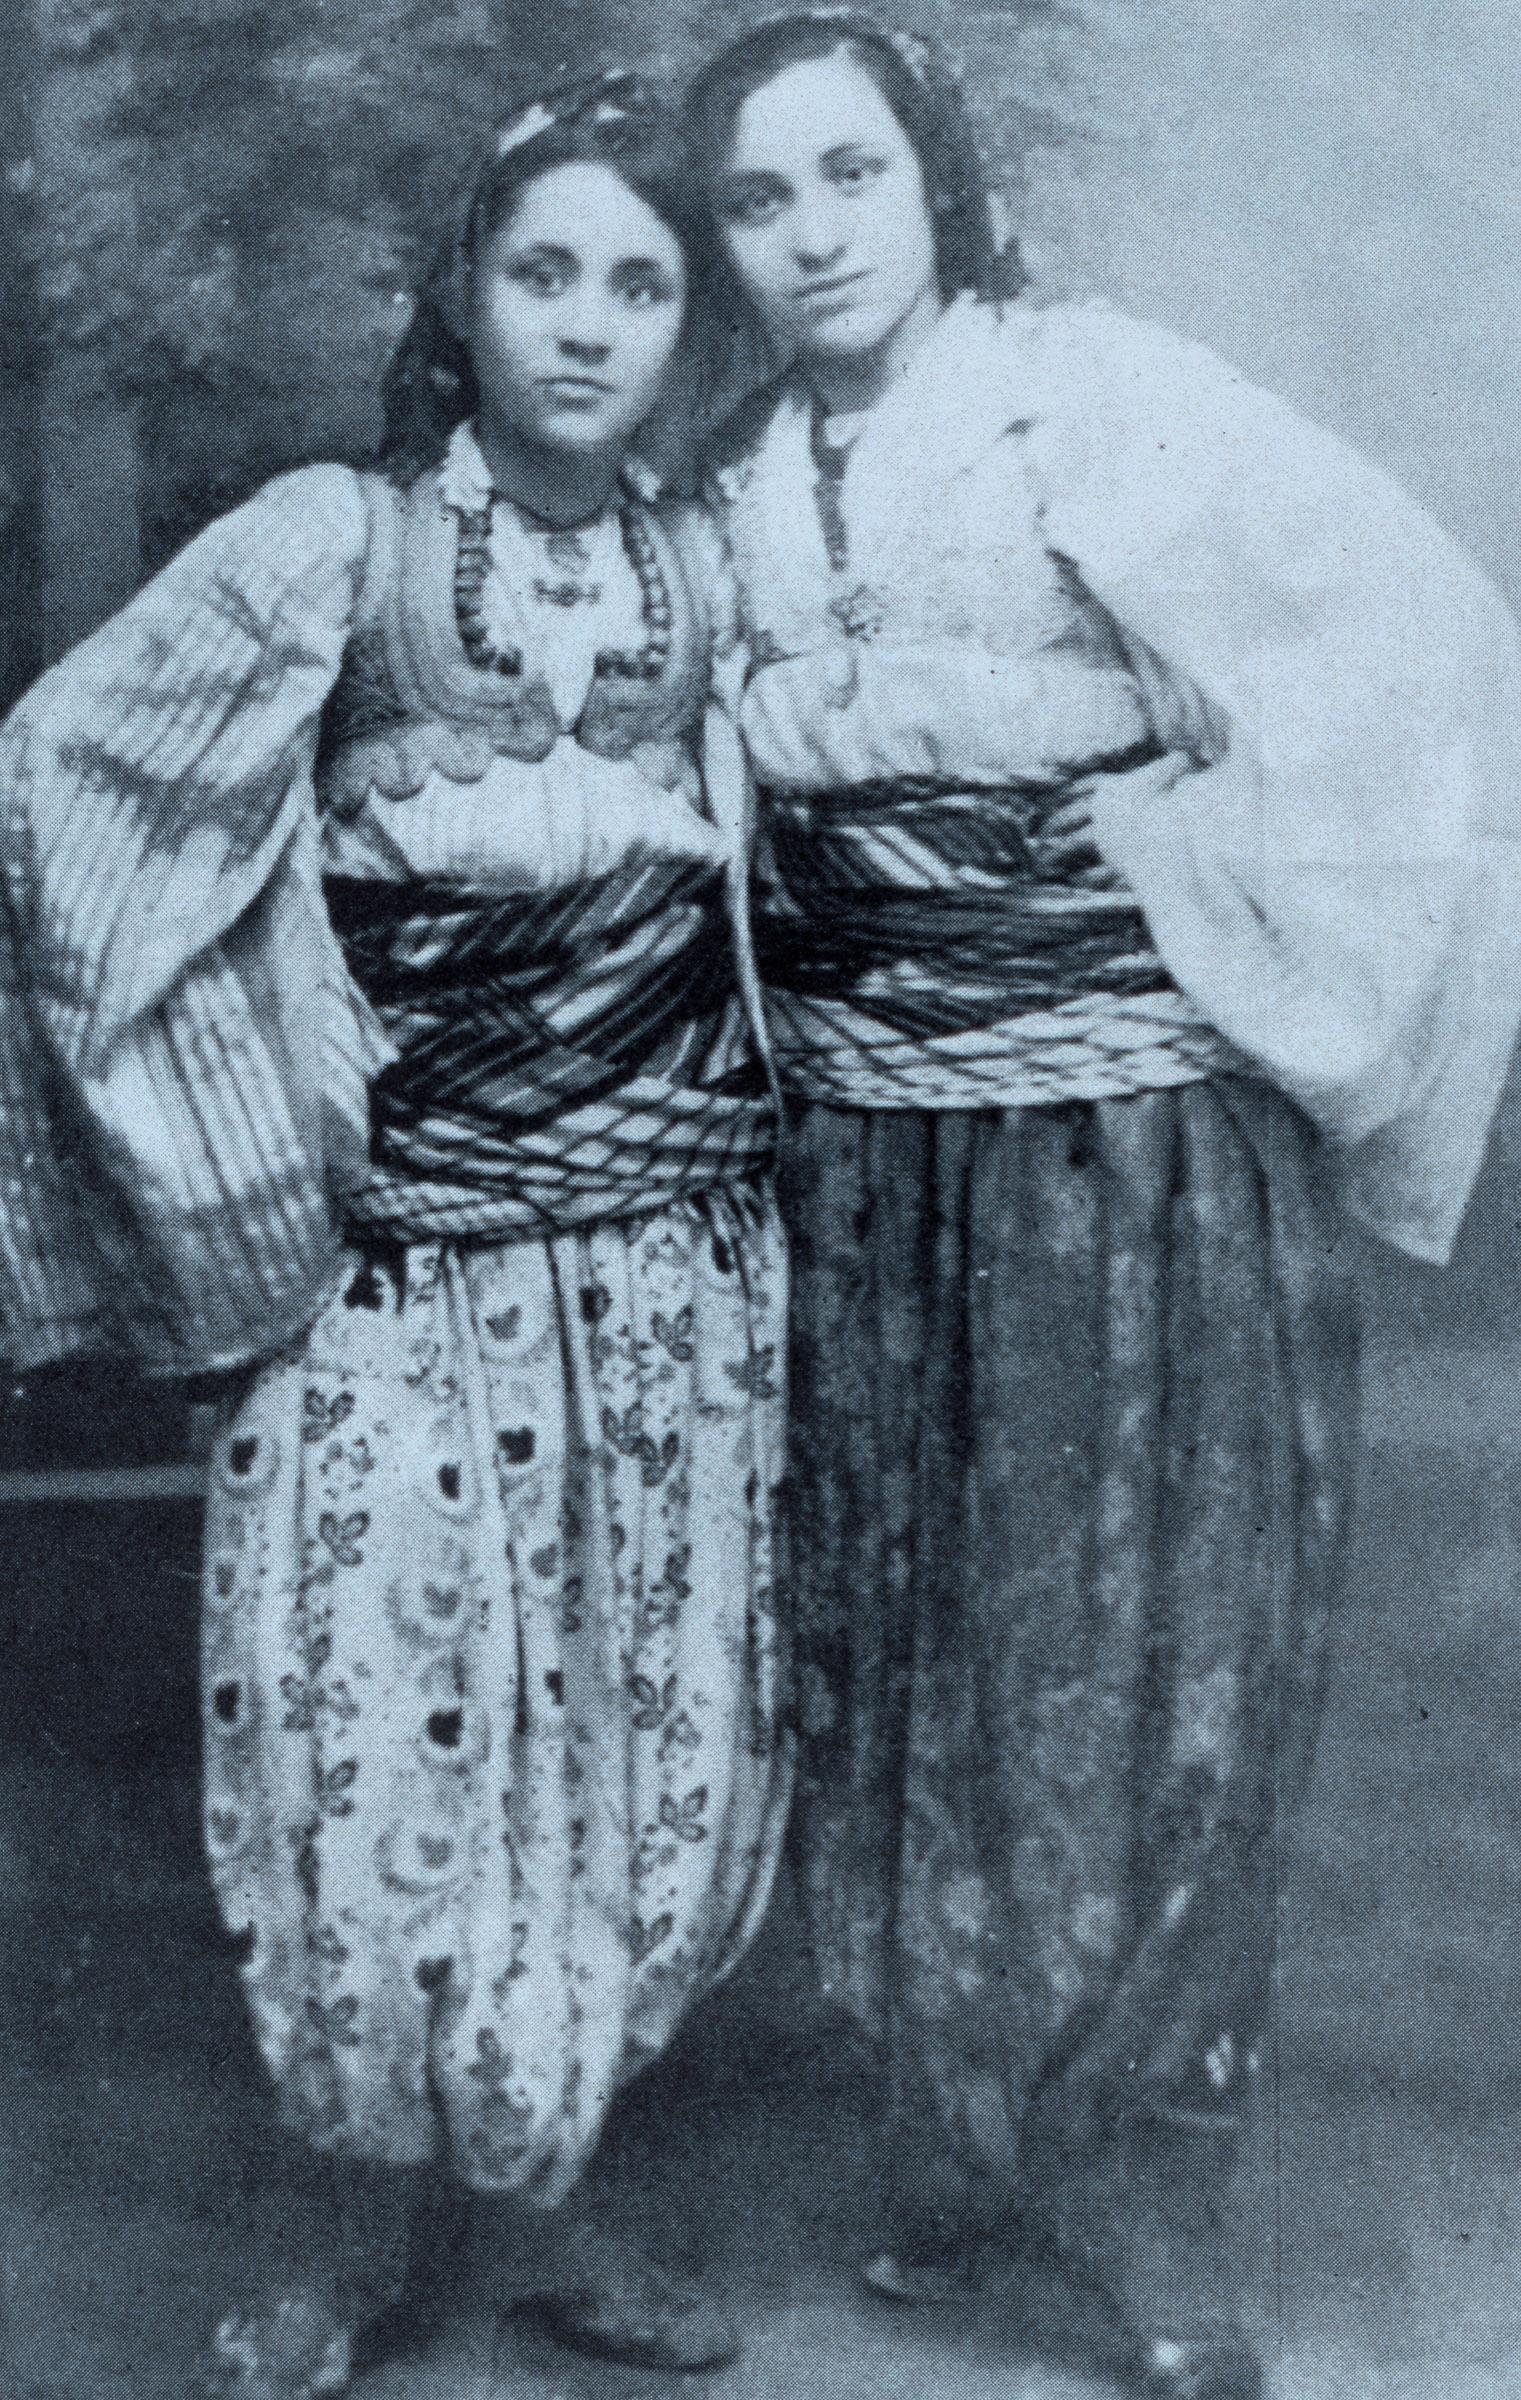 The young Albanian born Anjez�� Gonxhe Bojaxhiu, future Mother Teresa of Calcutta, with her sister Aga, in Macedonian traditional costume. (Photo by Vittoriano Rastelli/Corbis via Getty Images)